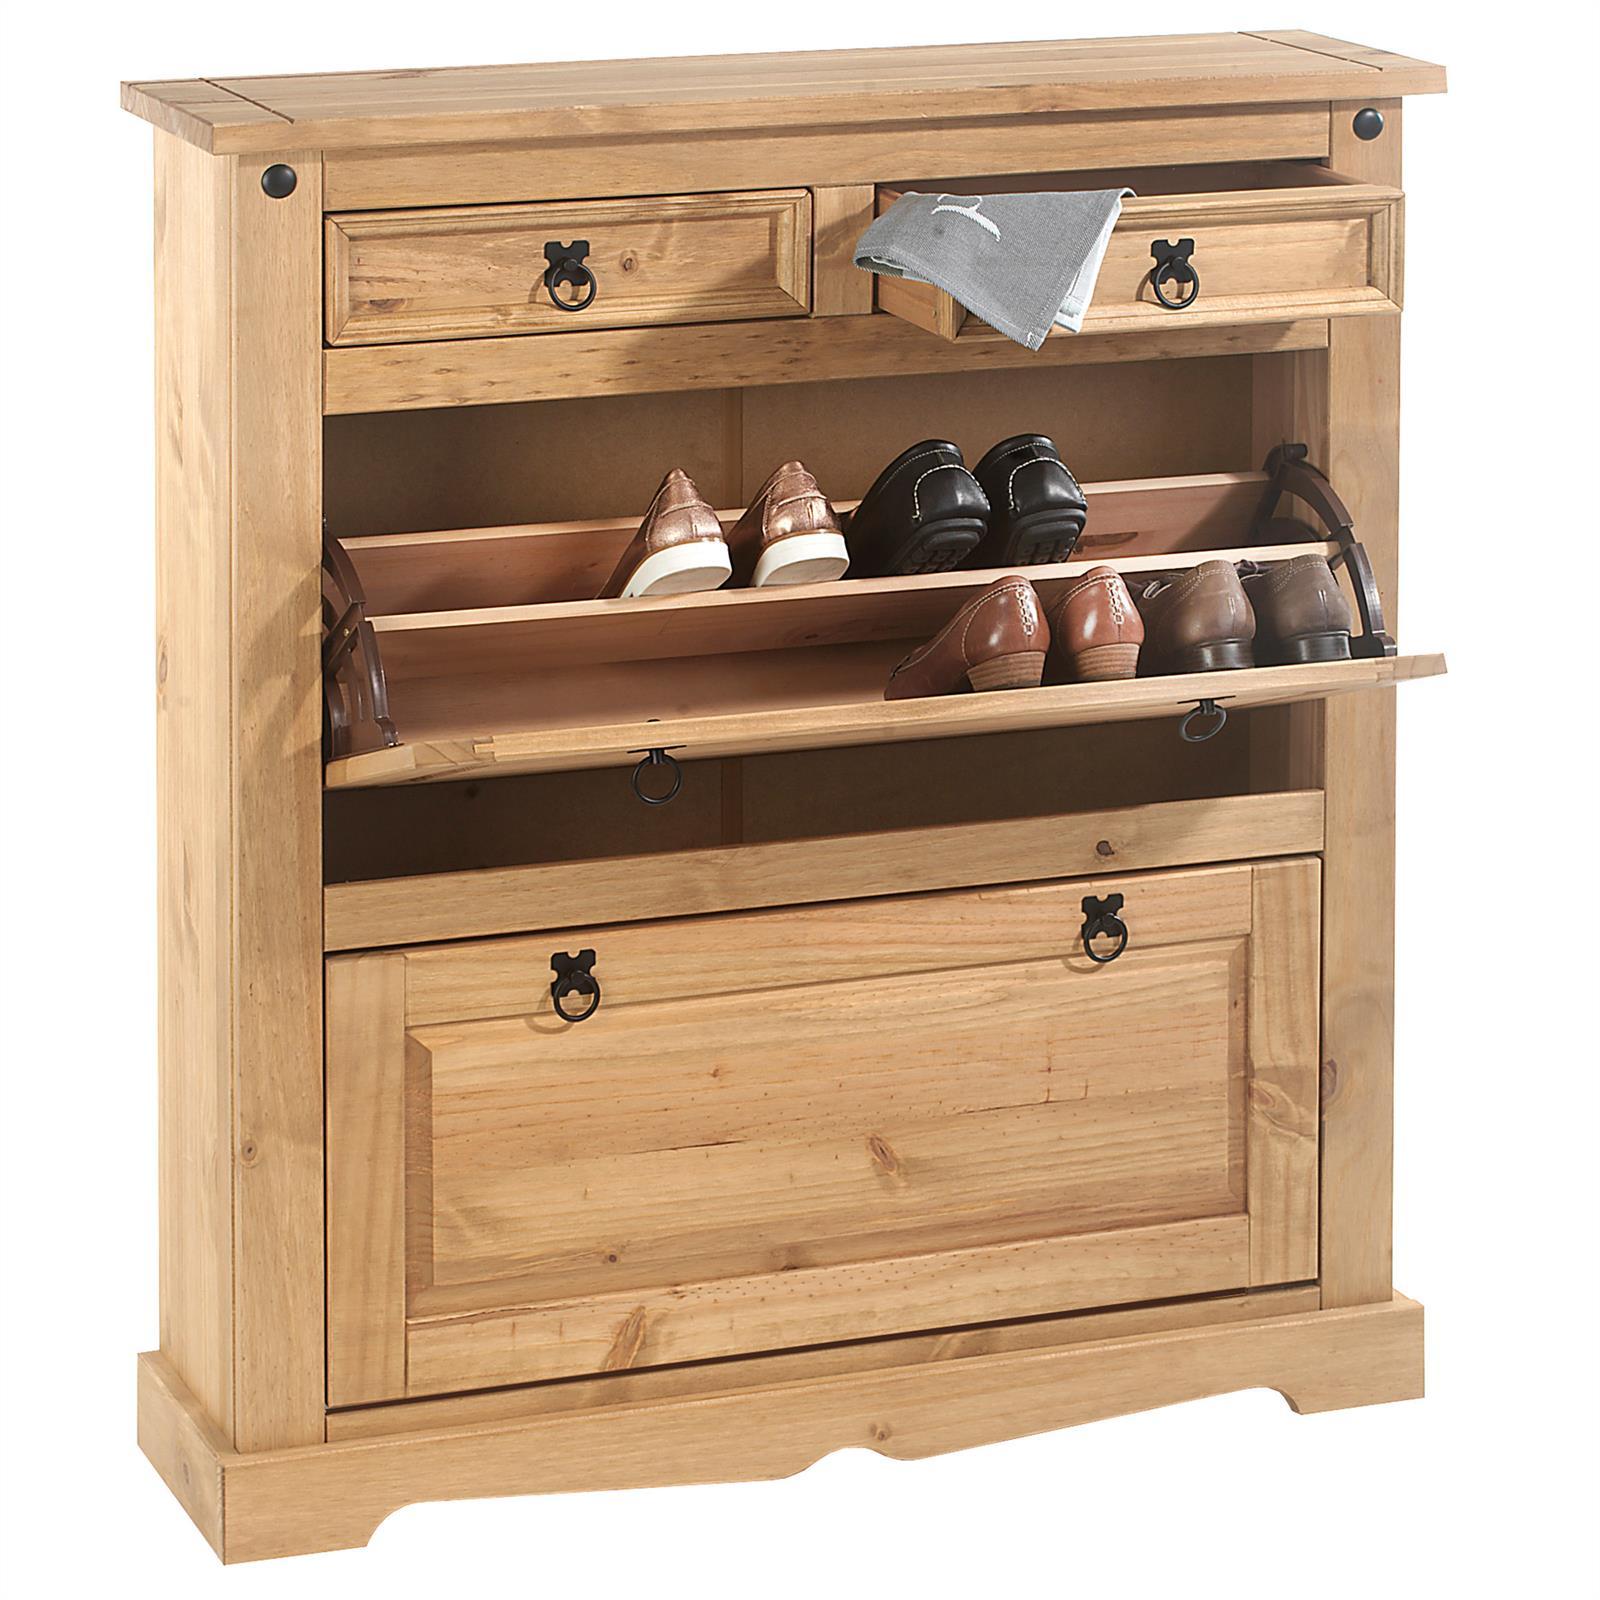 meuble chaussures en pin tequila style mexicain 2 abattants et 2 tiroirs finition cir e. Black Bedroom Furniture Sets. Home Design Ideas